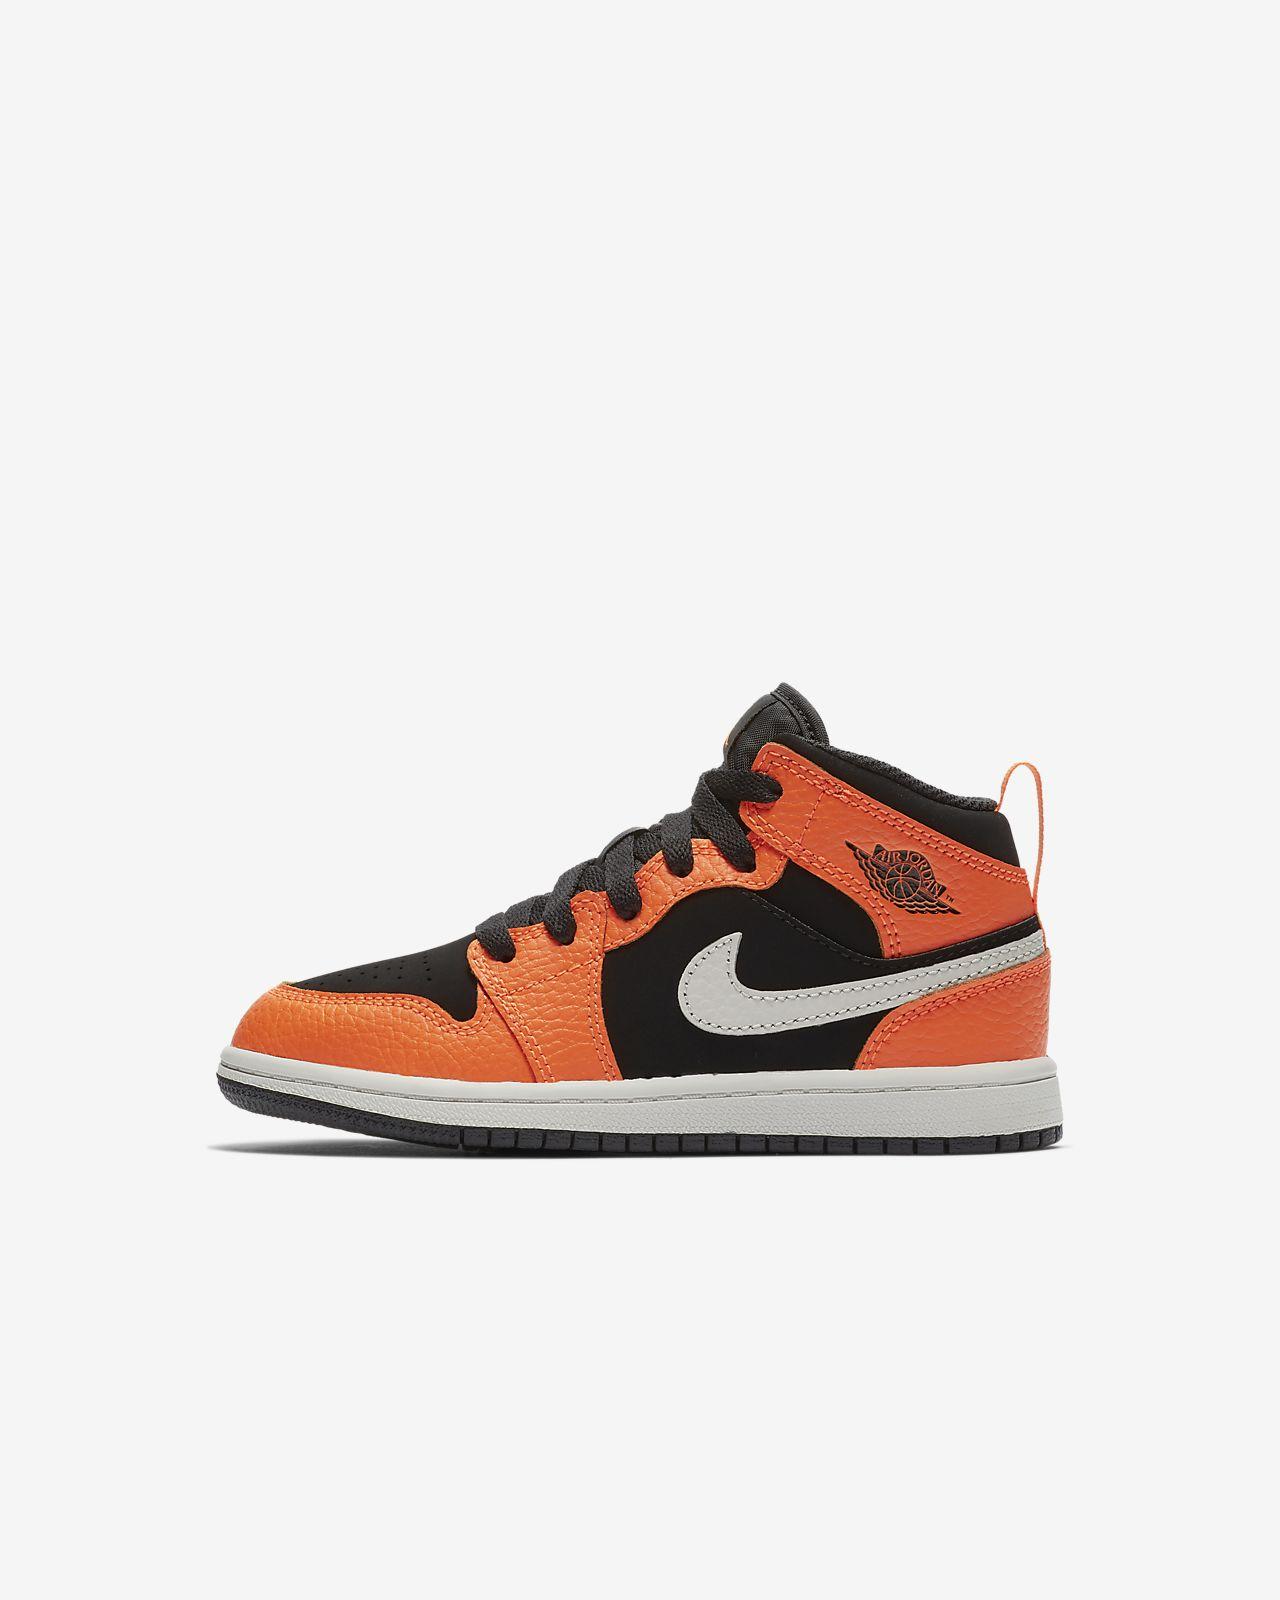 a8ef6ae4cfb ... Air Jordan 1 Mid Little Kids  Shoe